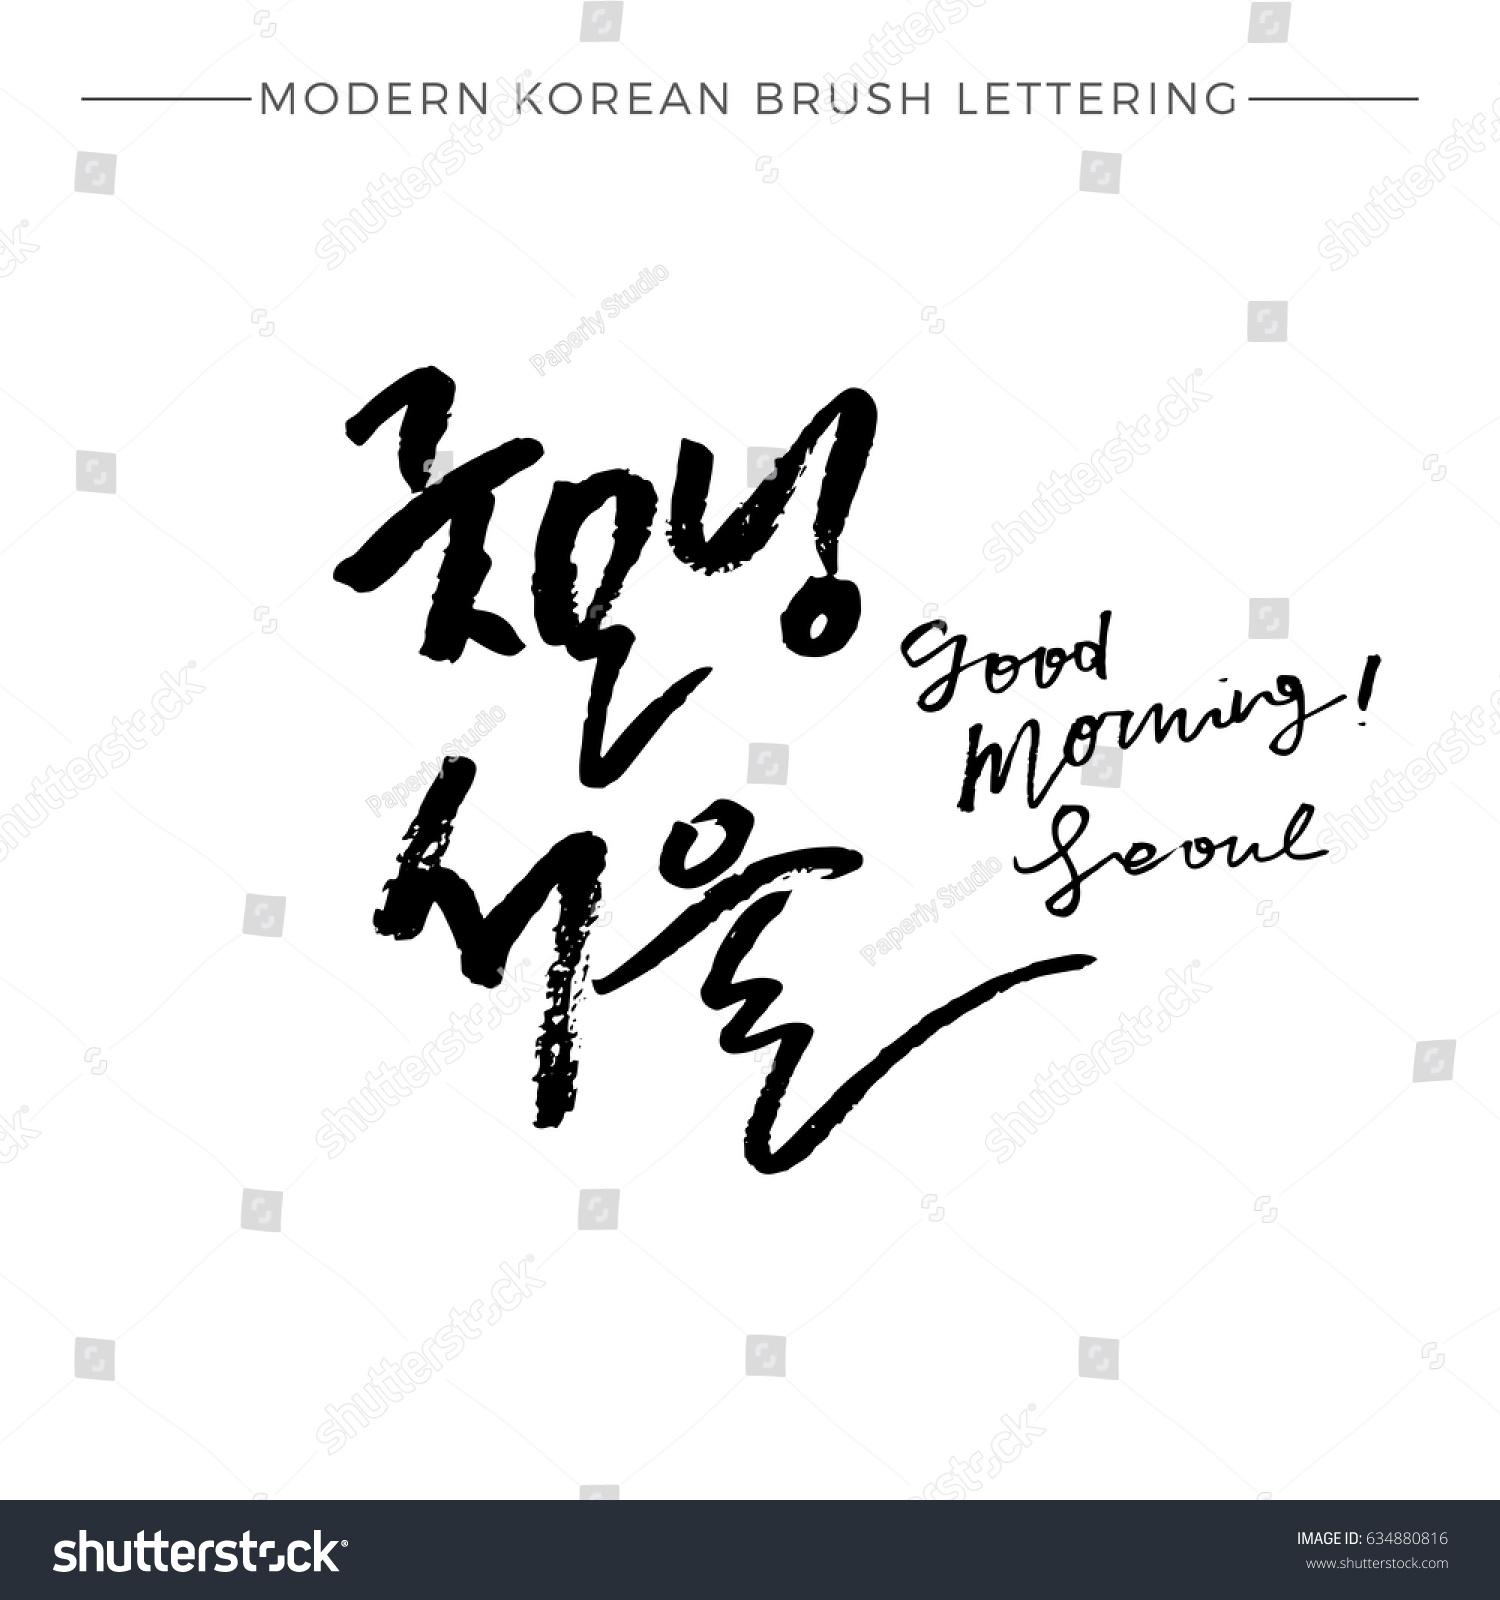 Good Morning In Korean Slang : Korean calligraphy good morning seoul hangul stock vector